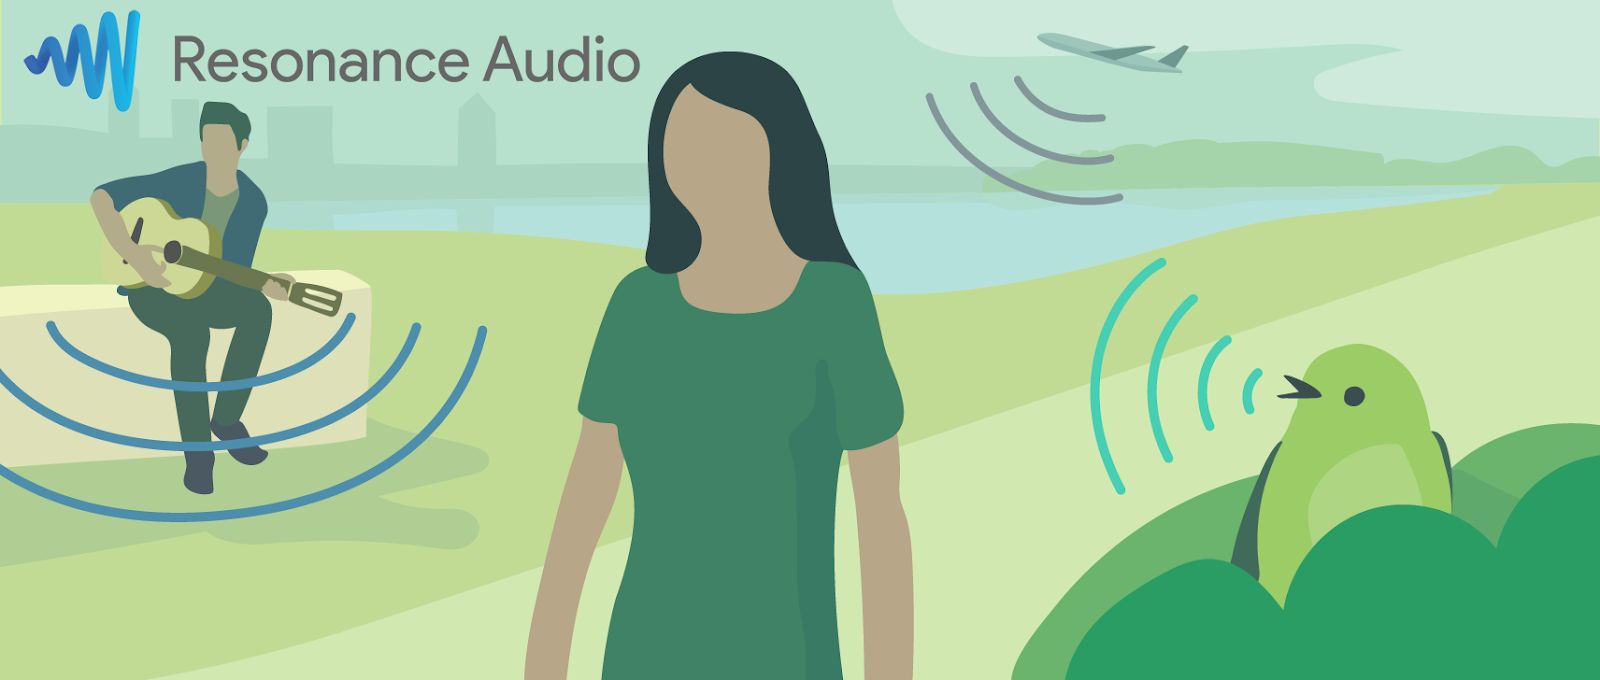 - RA OS Blog Header - Google Developers Blog: Open Sourcing Resonance Audio